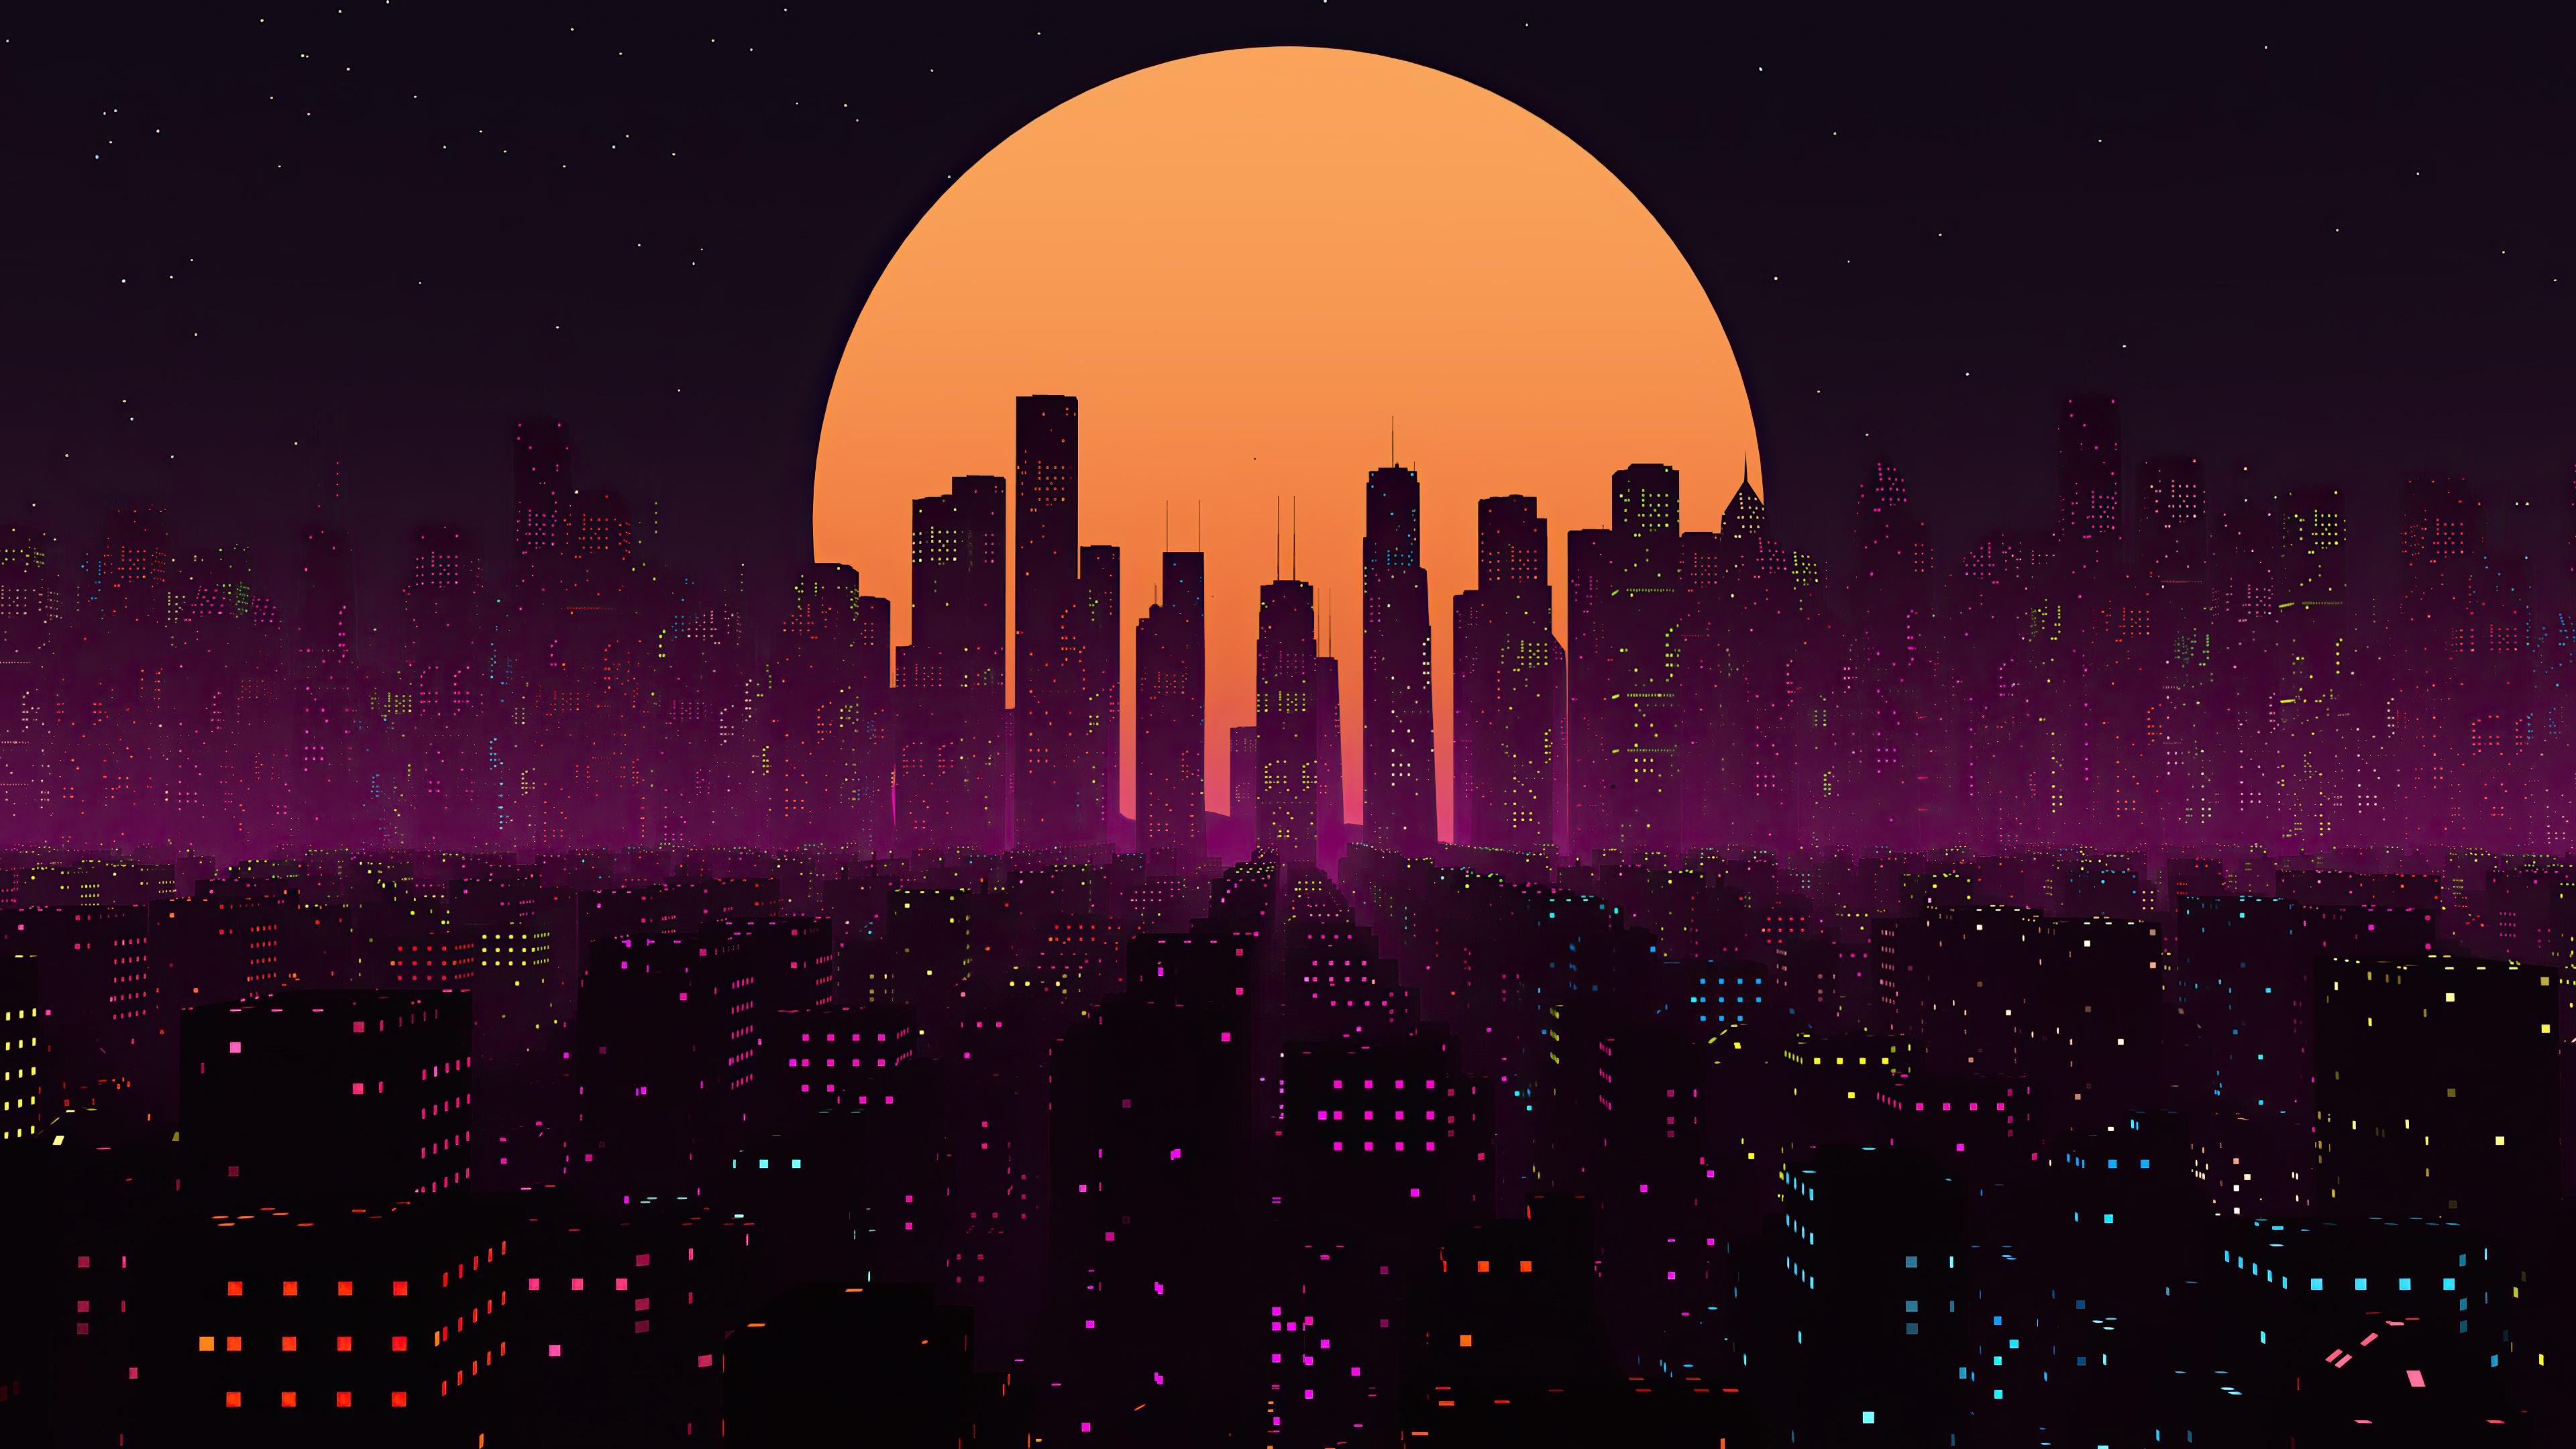 Retrowave City Sunset wallpaper